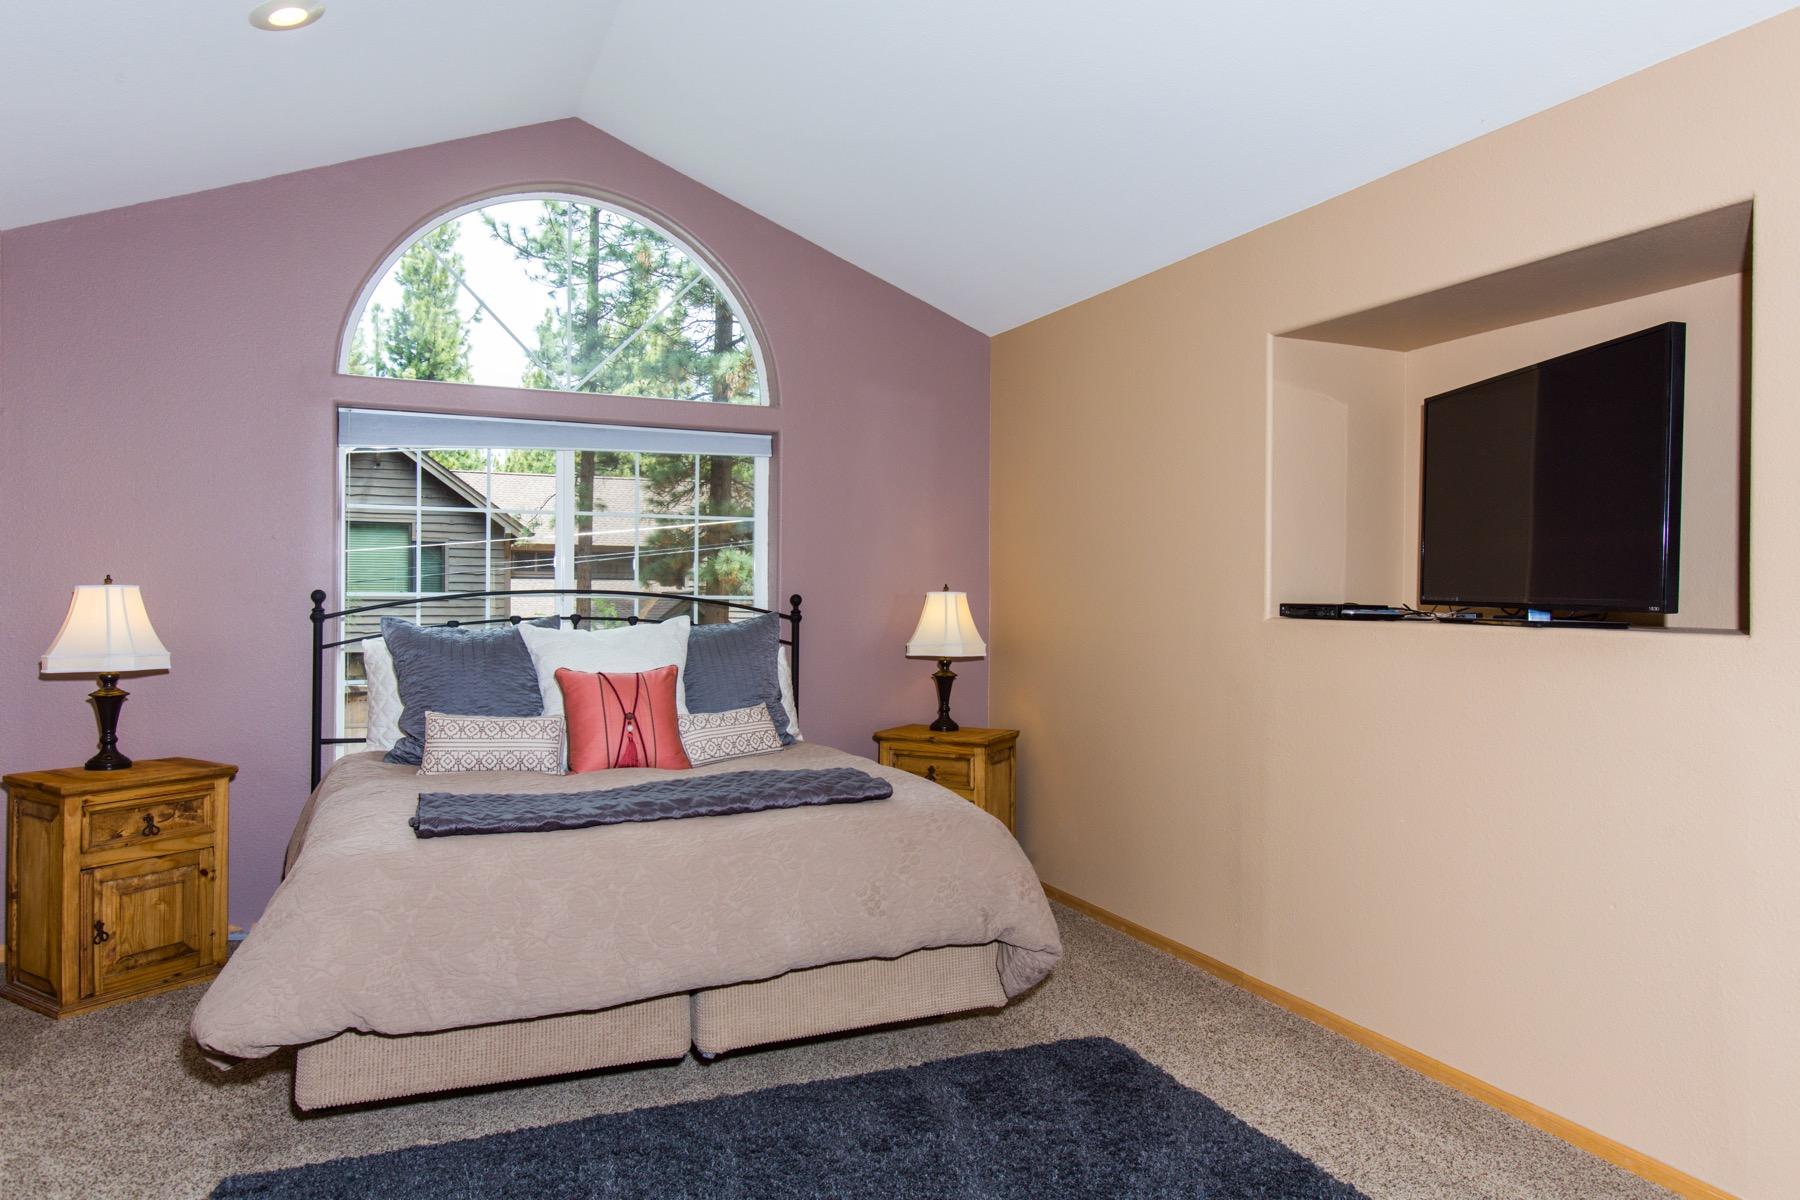 Appreciate  this spacious master bedroom with big windows.